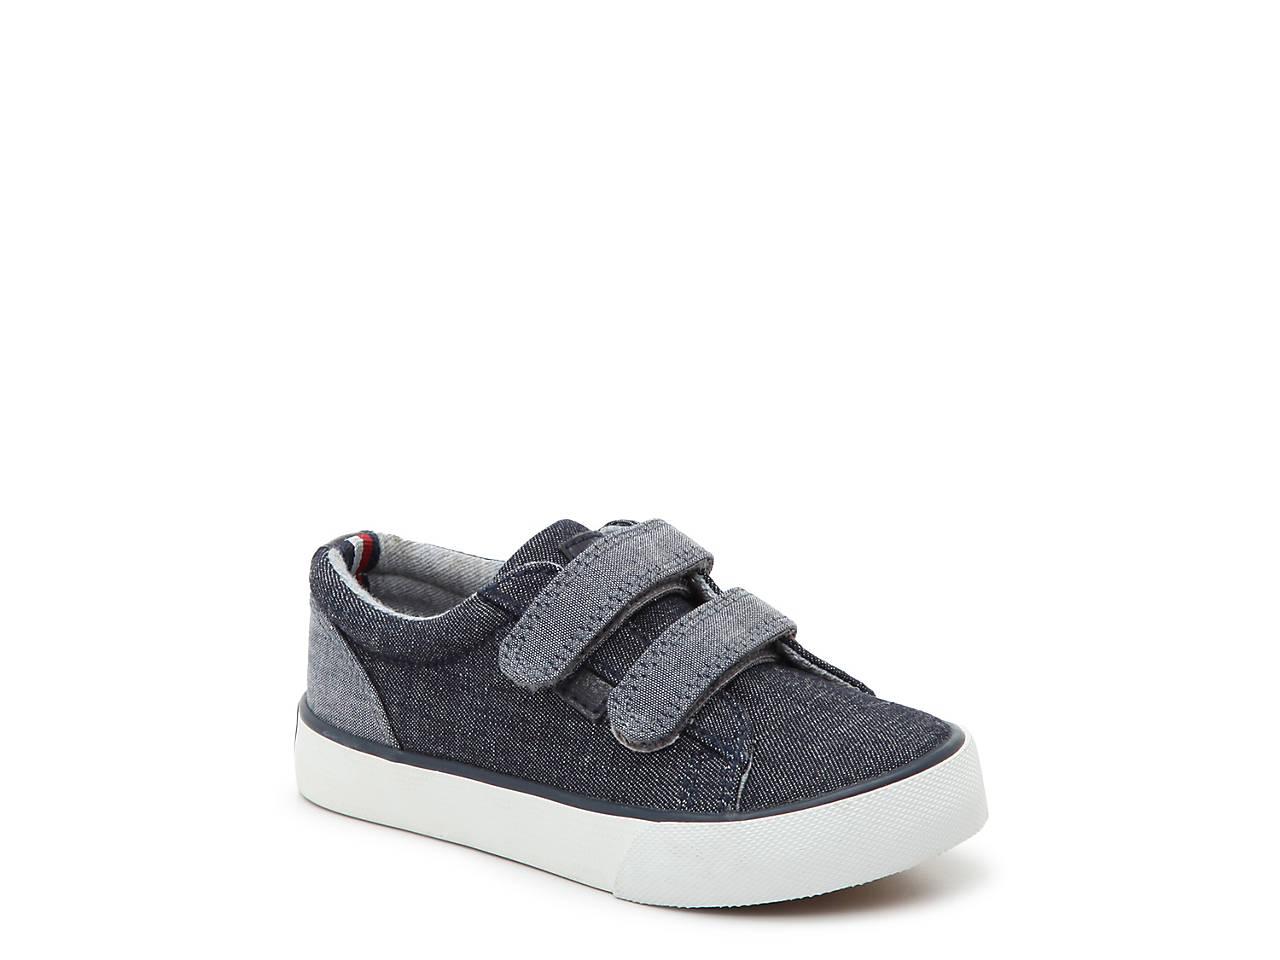 9d076bba Tommy Hilfiger Roddy Toddler Sneaker Kids Shoes   DSW